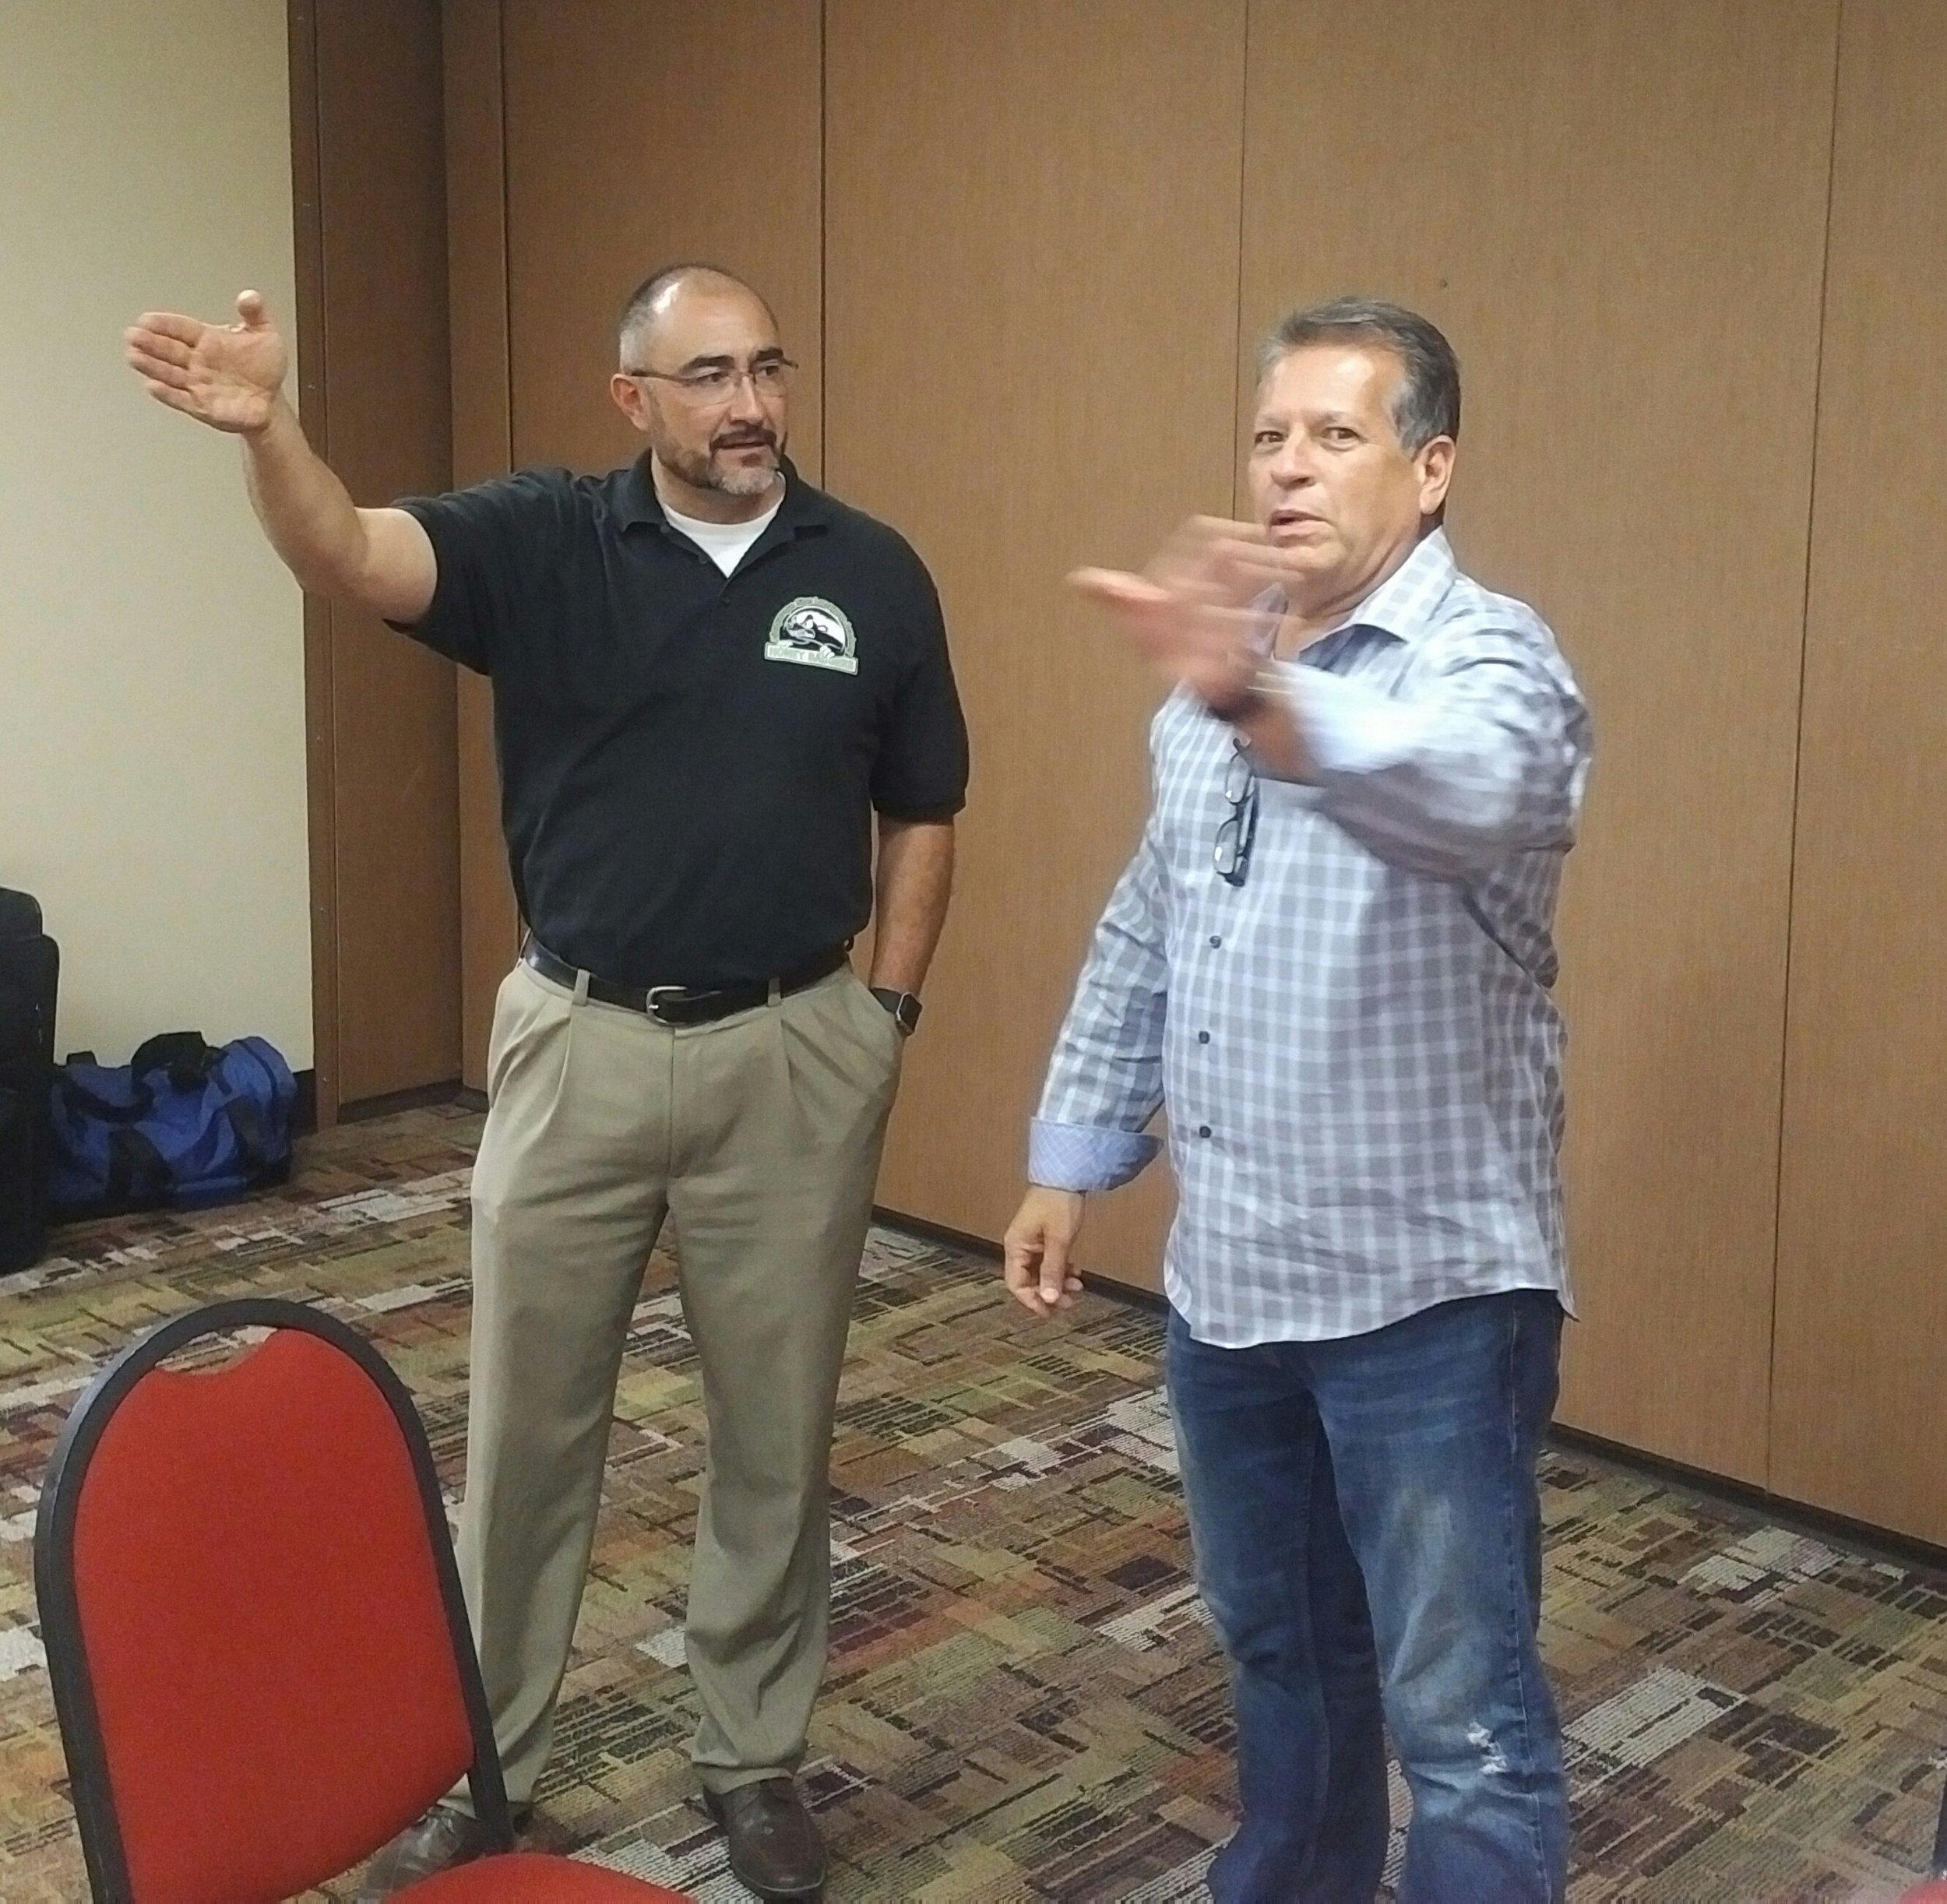 ASLA Executive Director Rafe Martinez and legislative collaborator Rick Martinez